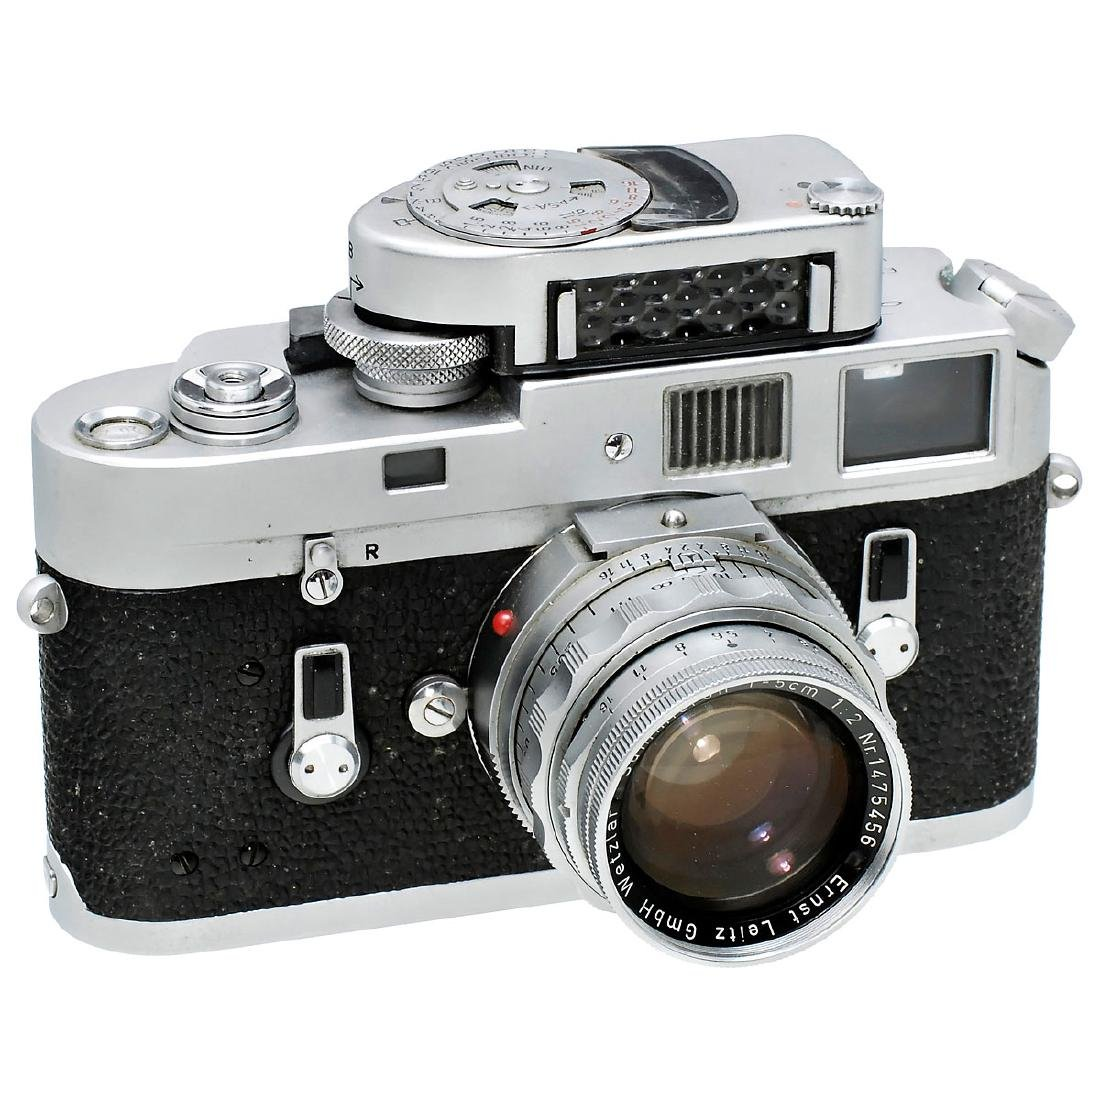 Leica M4 with Summicron 2/5 cm, 1967